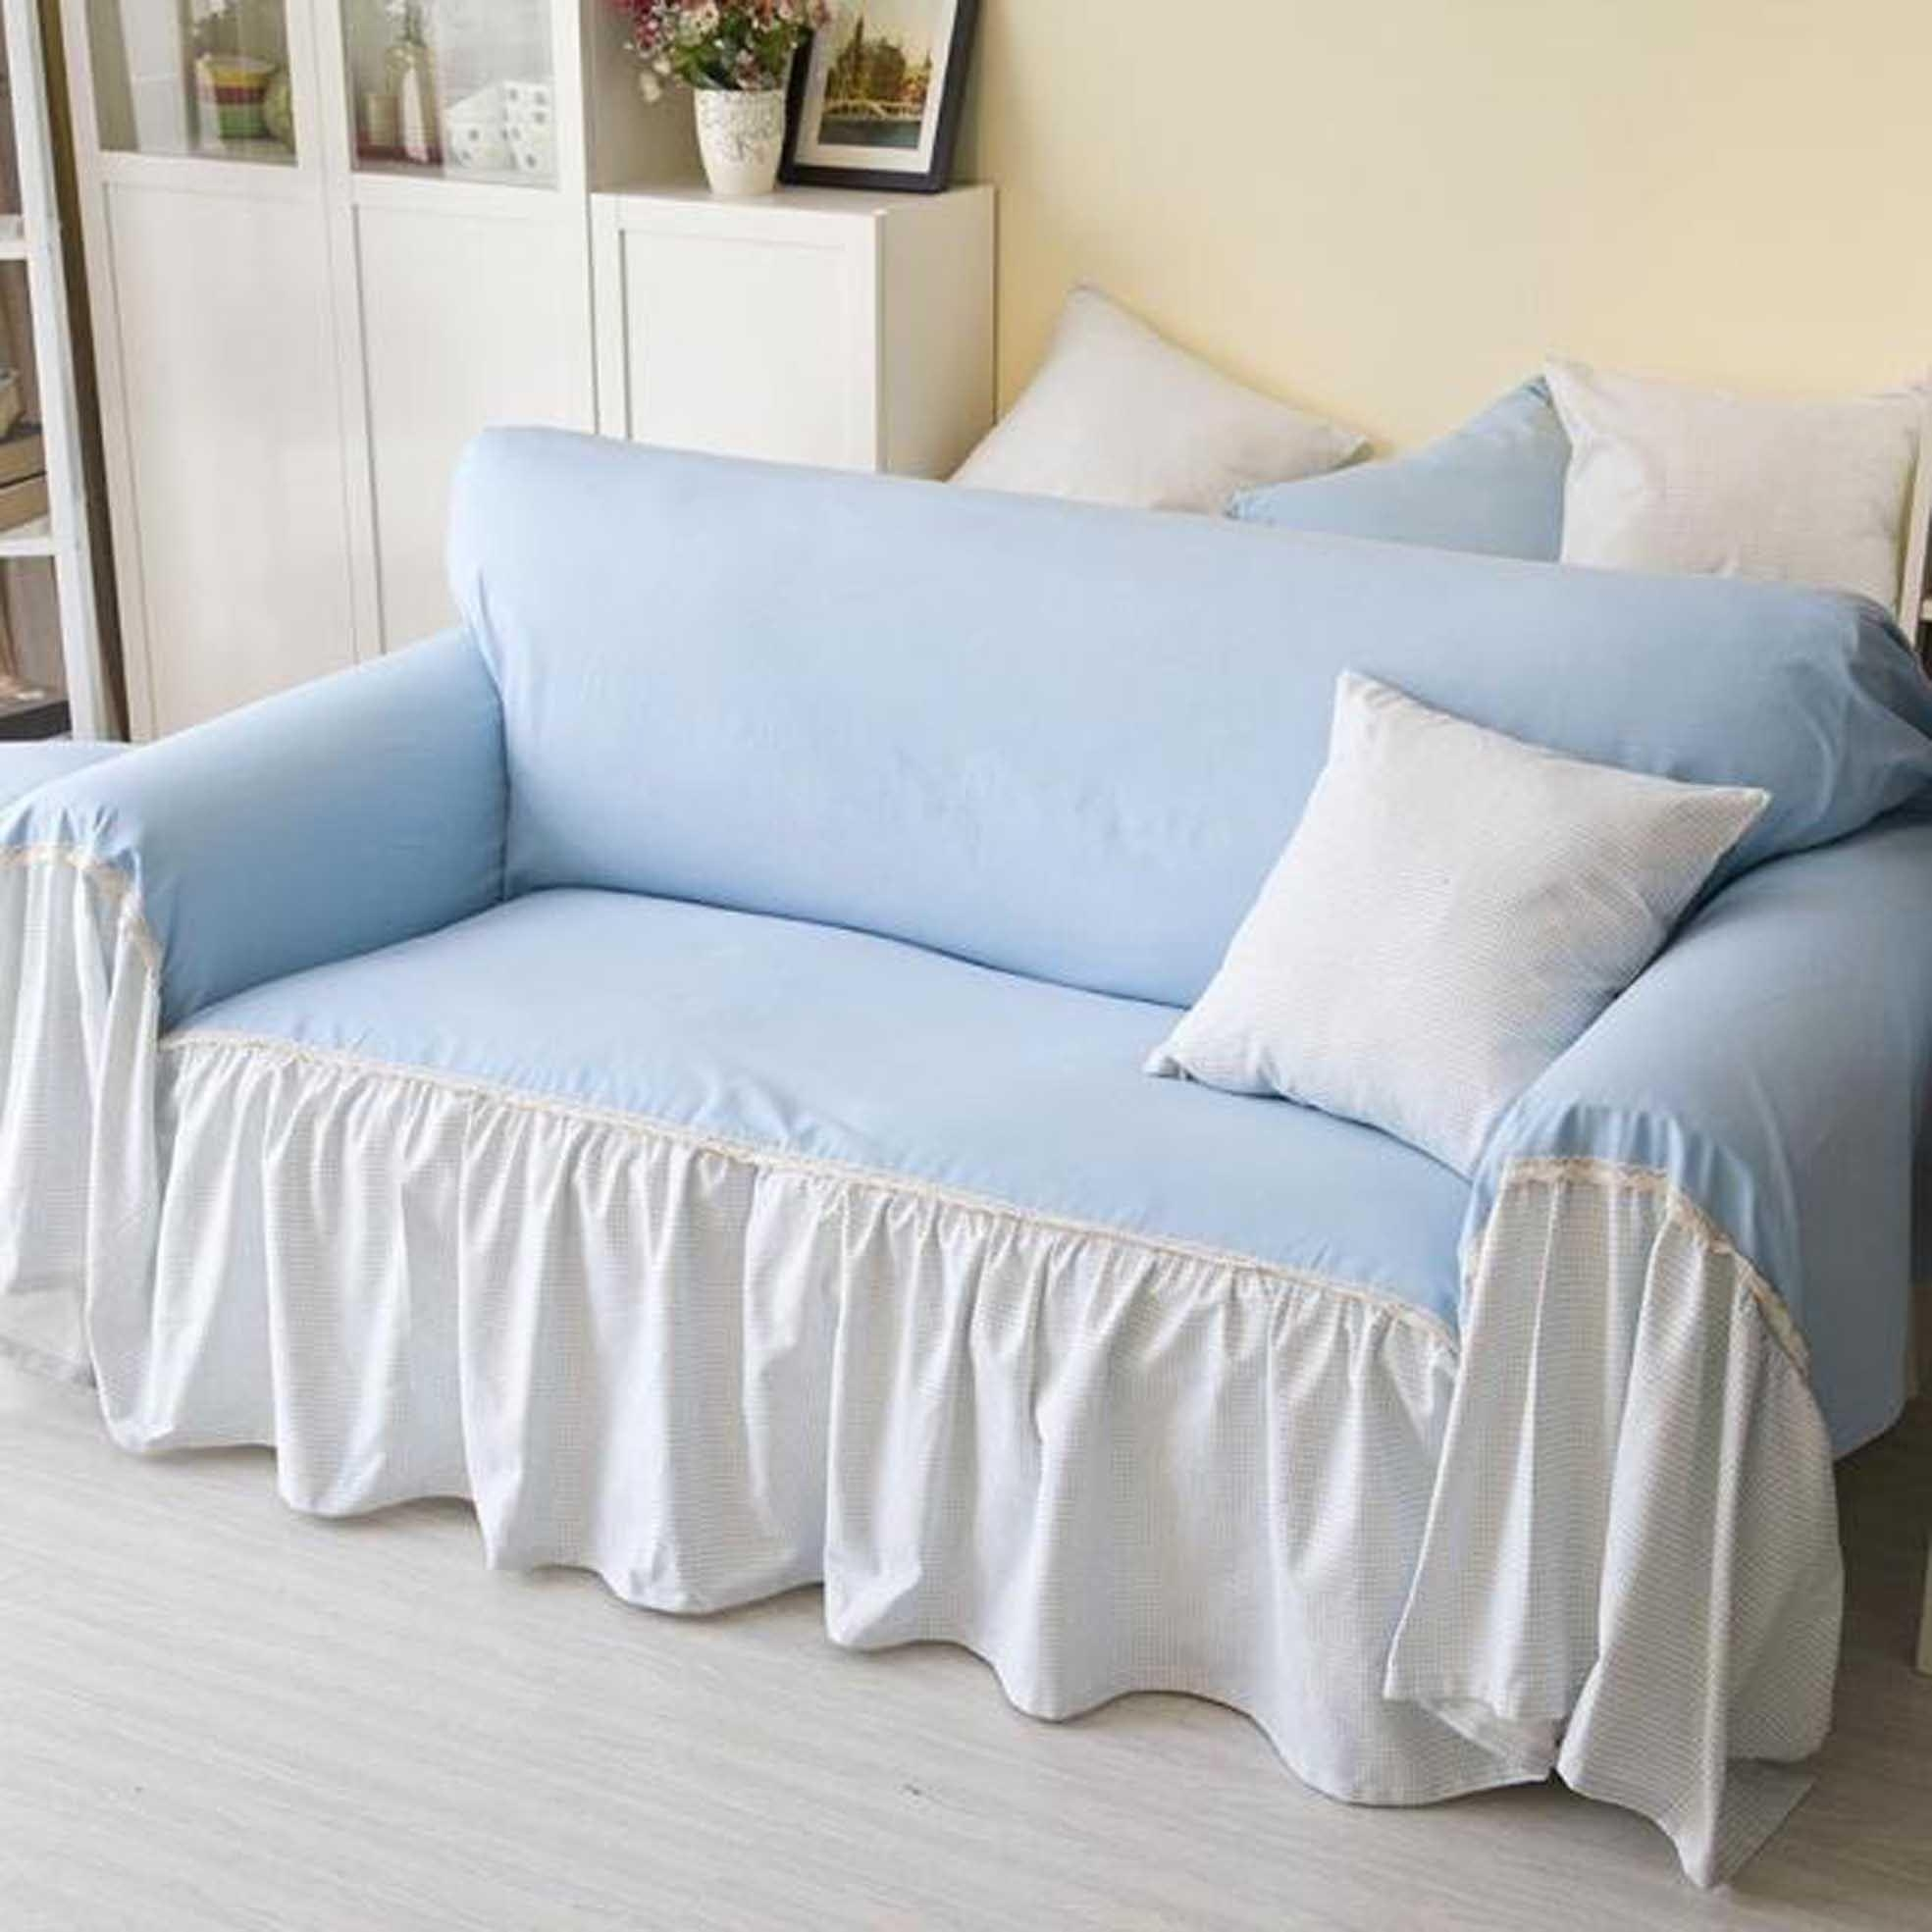 Furniture: 2 Piece Sofa Slipcover | Shabby Chic Sofa Slipcovers For Shabby Chic Sofa Slipcovers (Image 14 of 20)